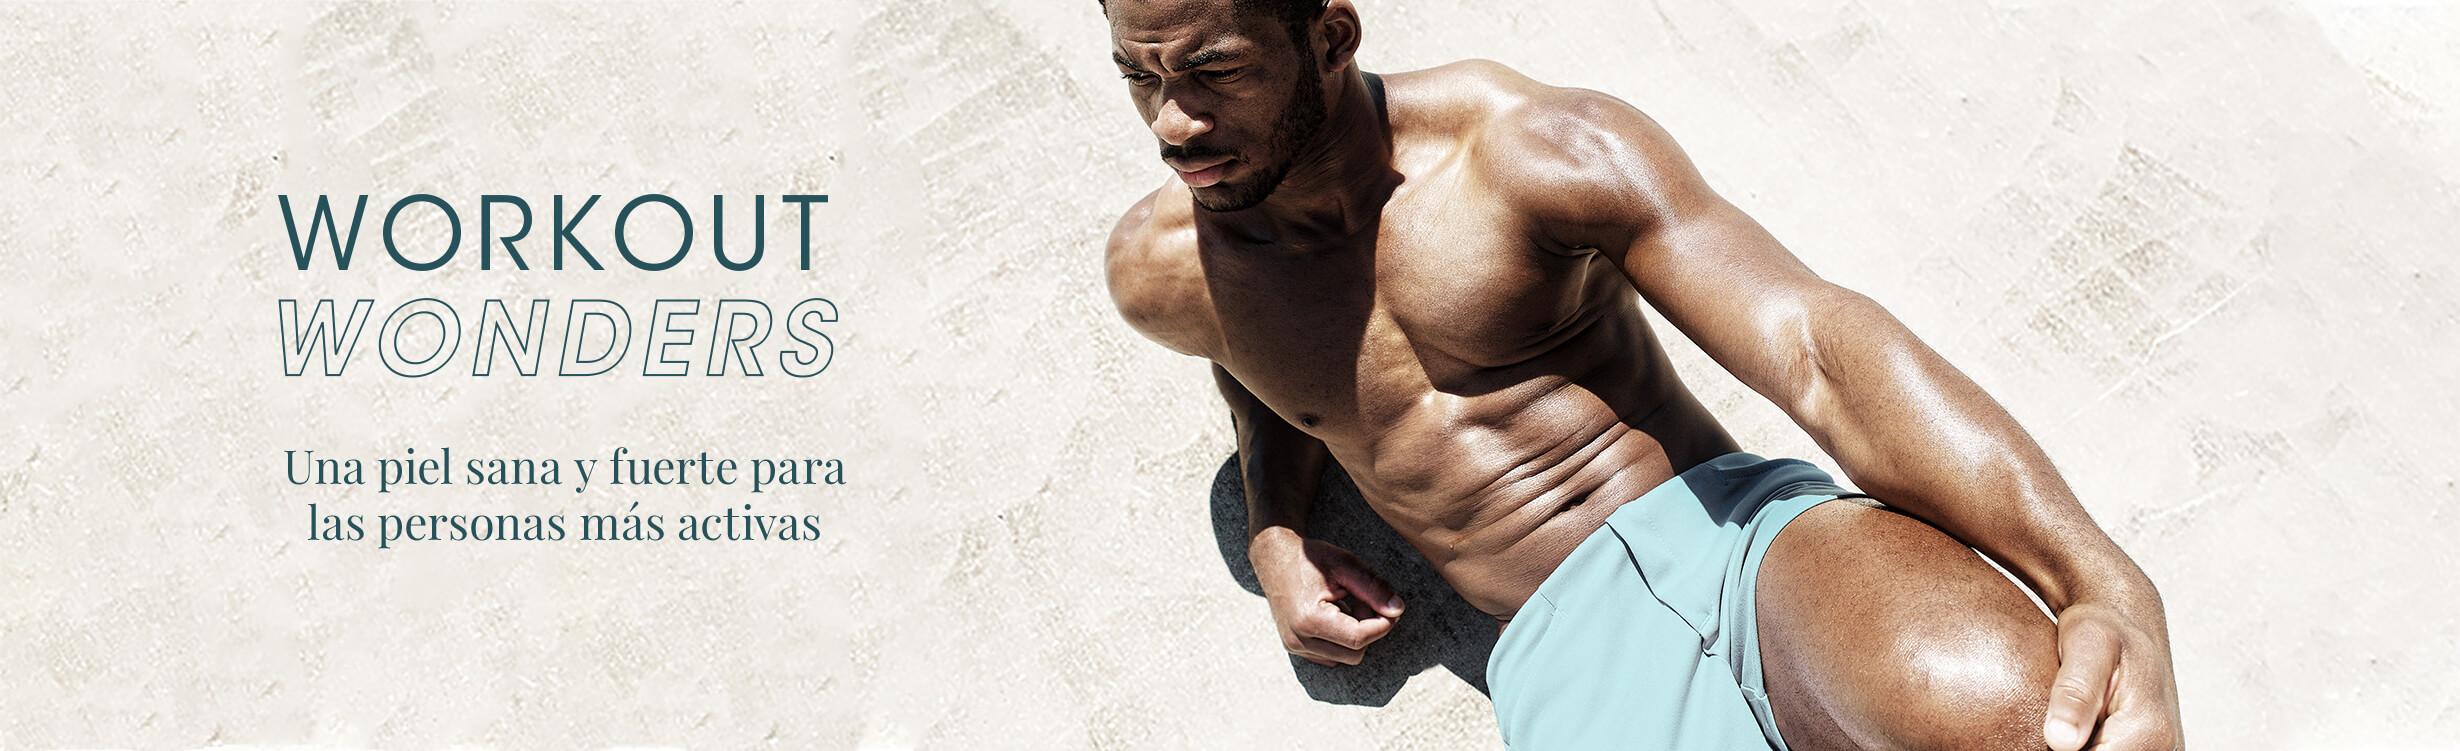 Workout Wonders